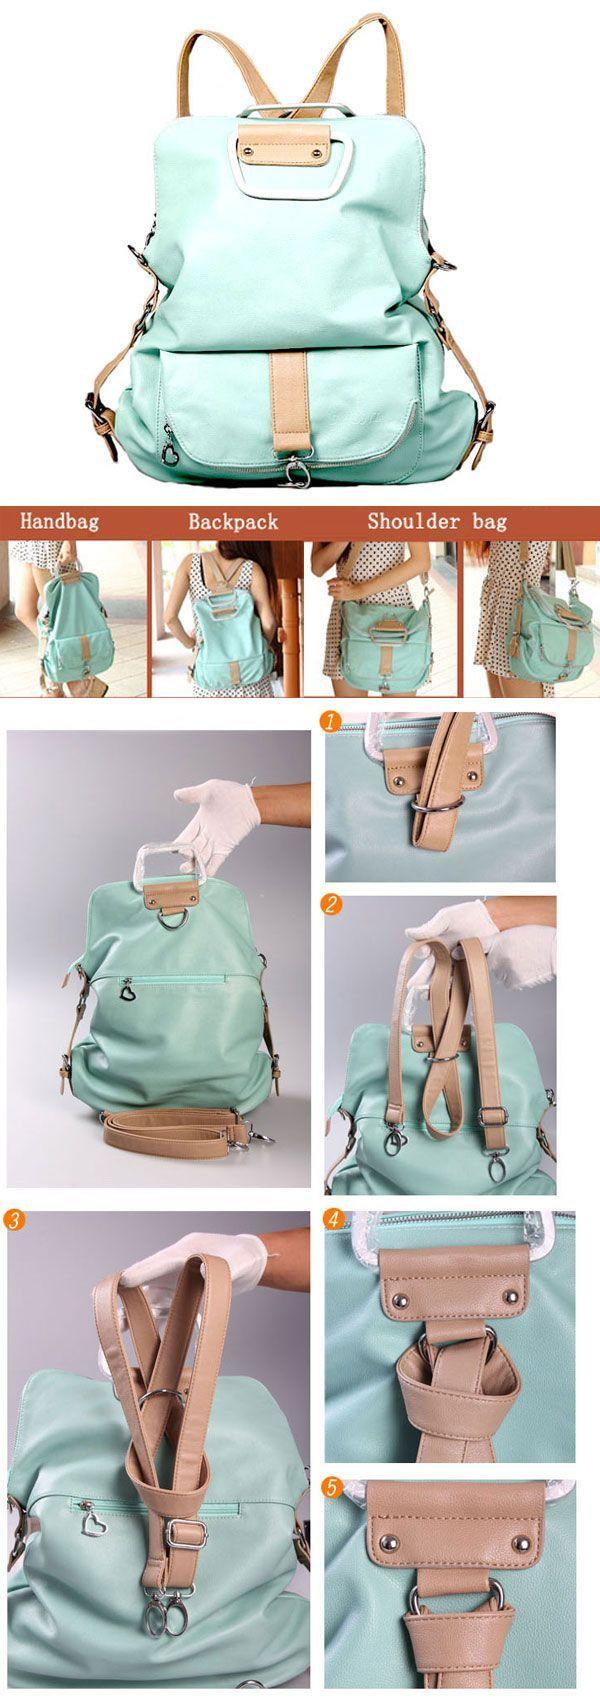 I am so happy to find the Unique Fresh Multifunction Backpack & Handbag & Shoulder Bag from ByGoods.com. I like it